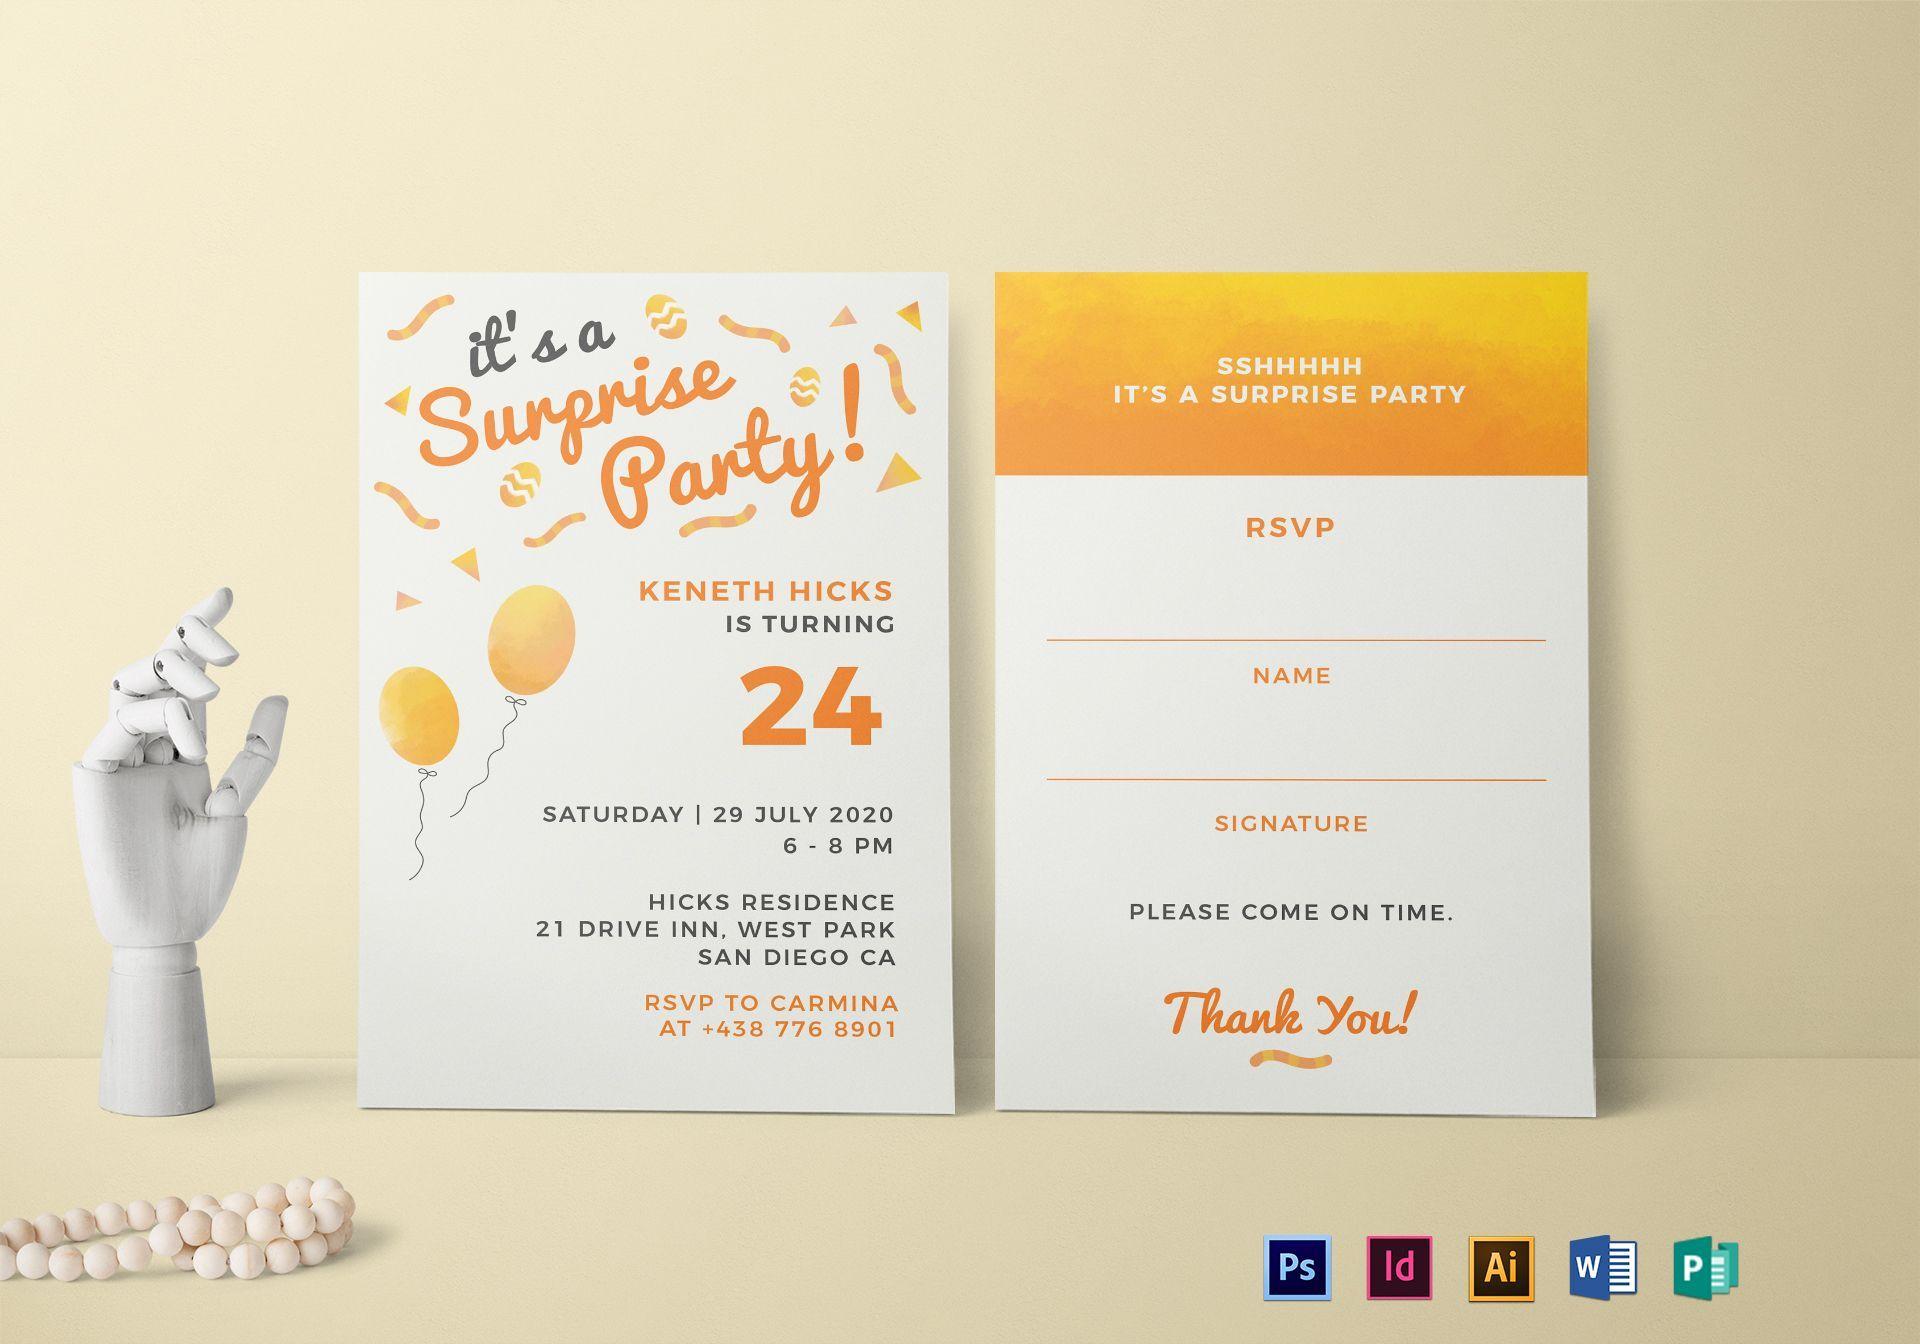 Surprise Birthday Party Invitation Template  Party invite